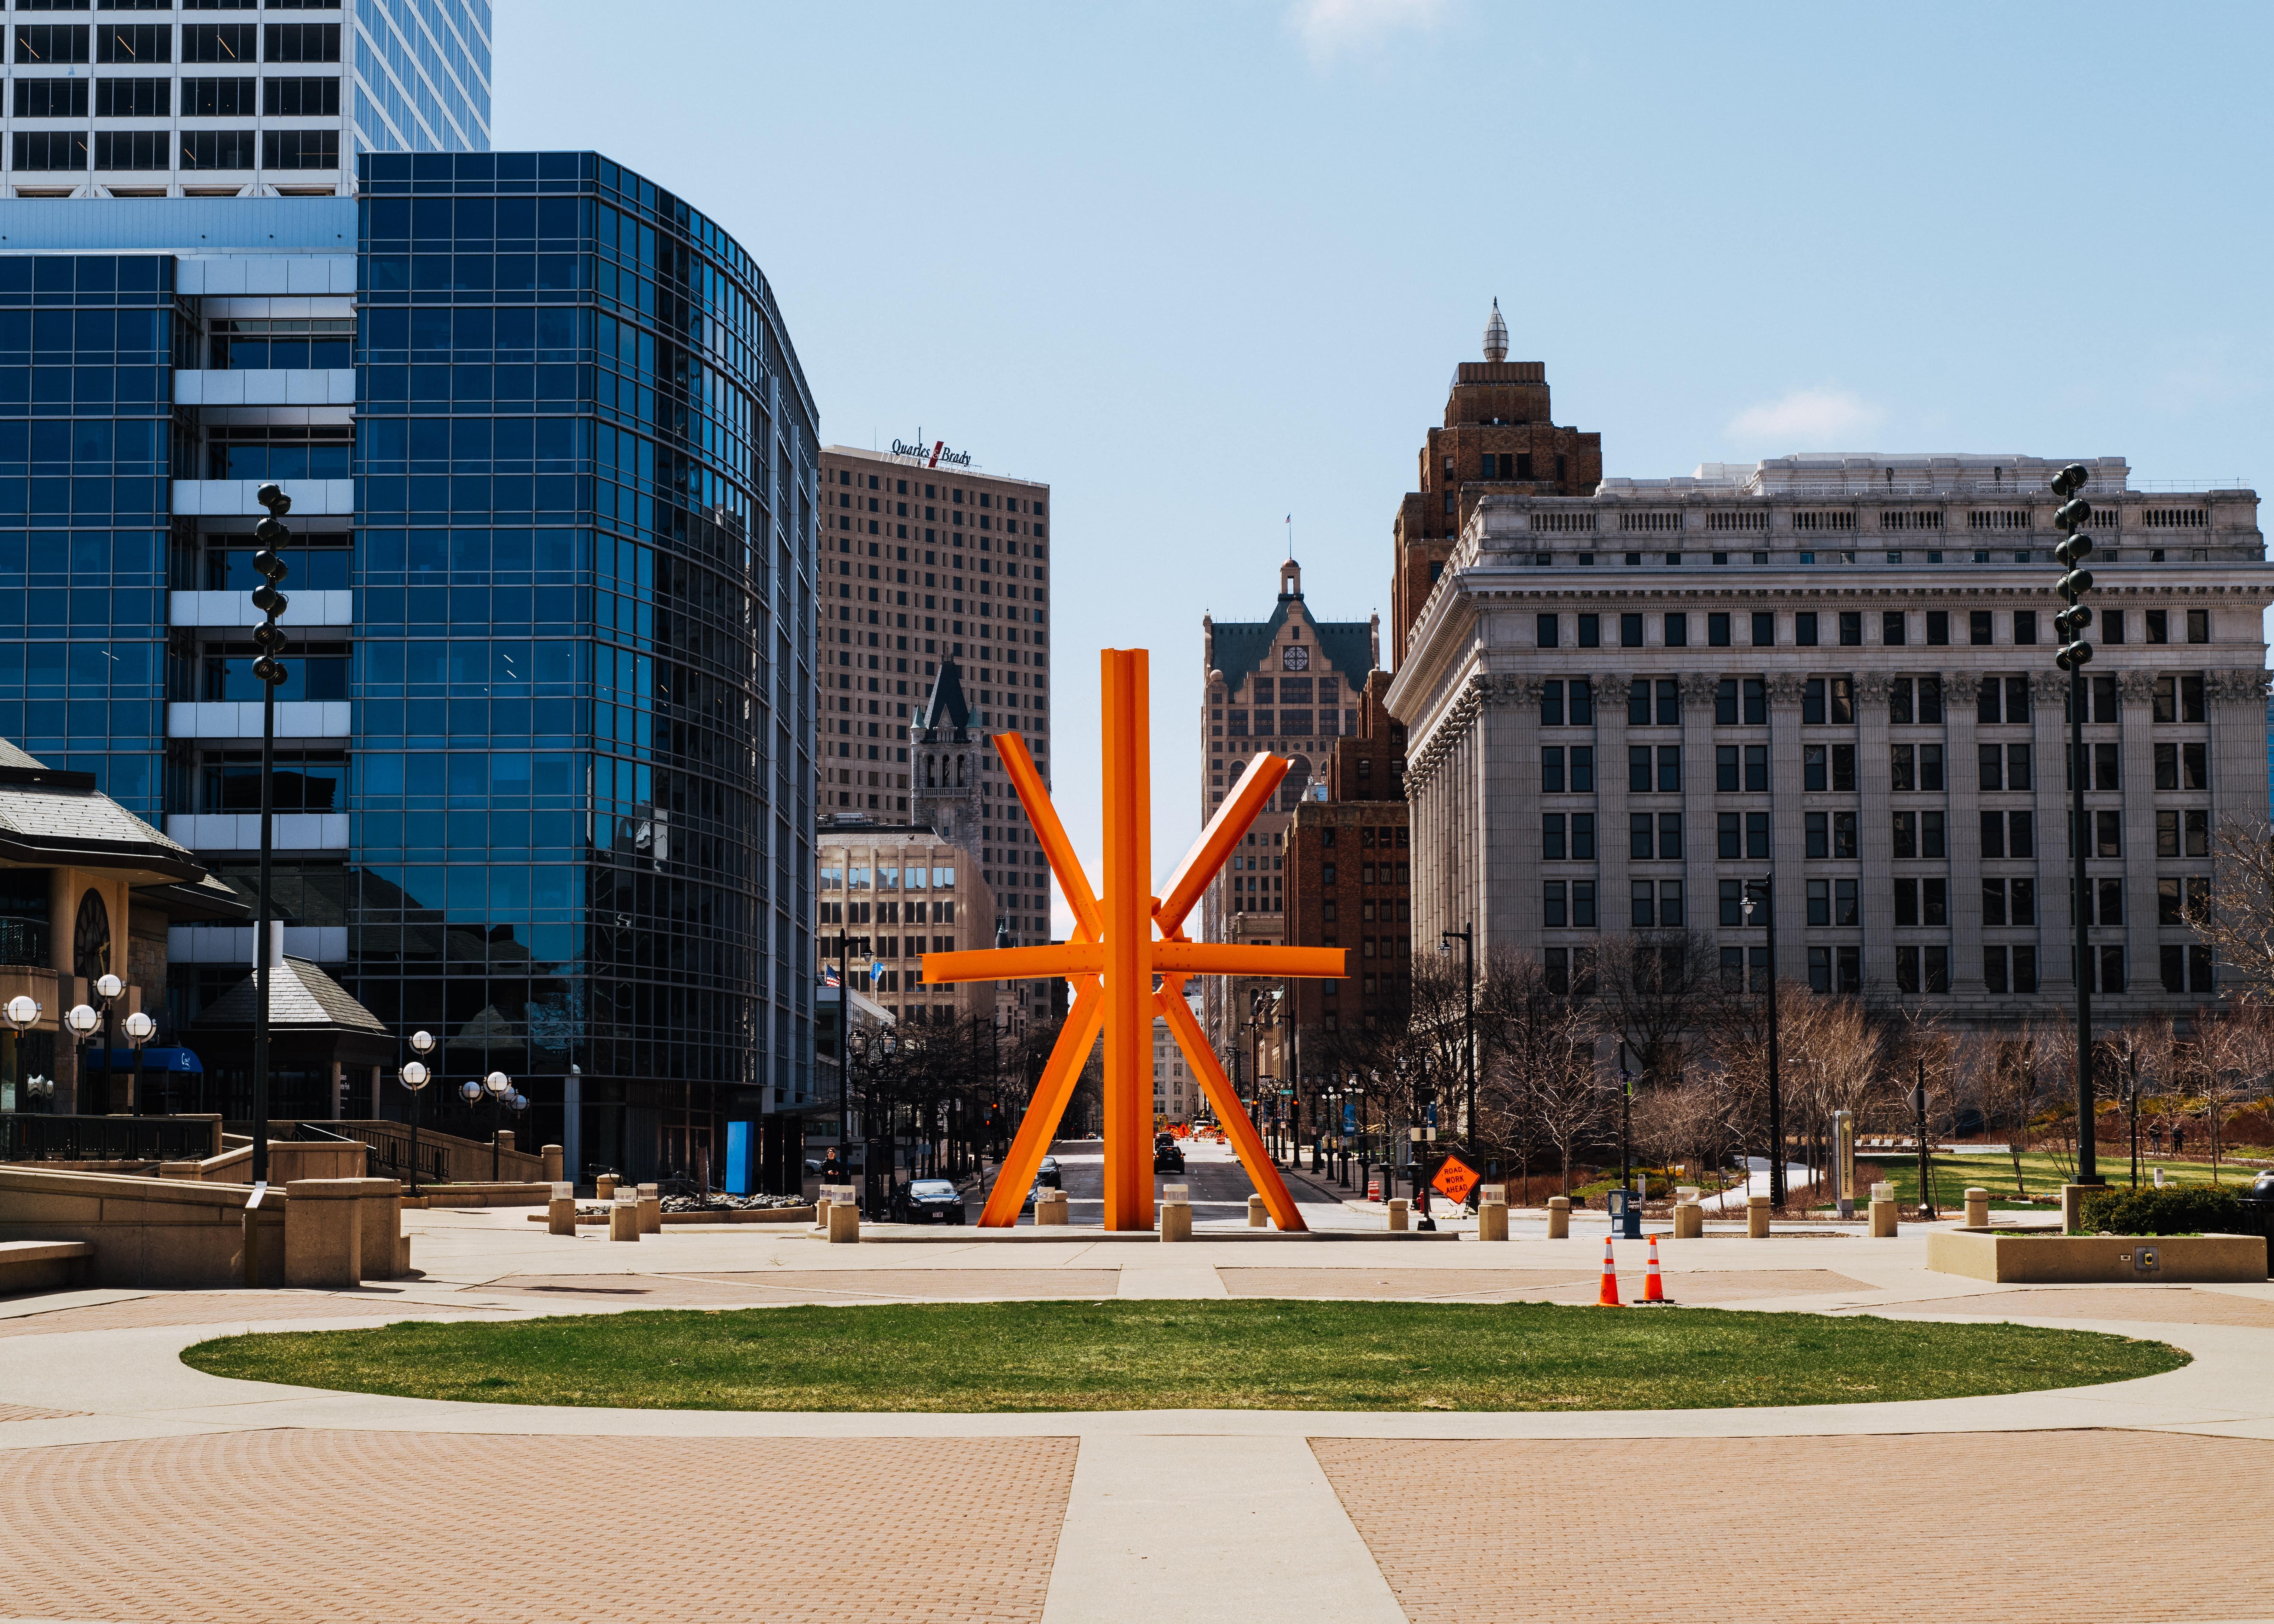 Modern public art structure downtown